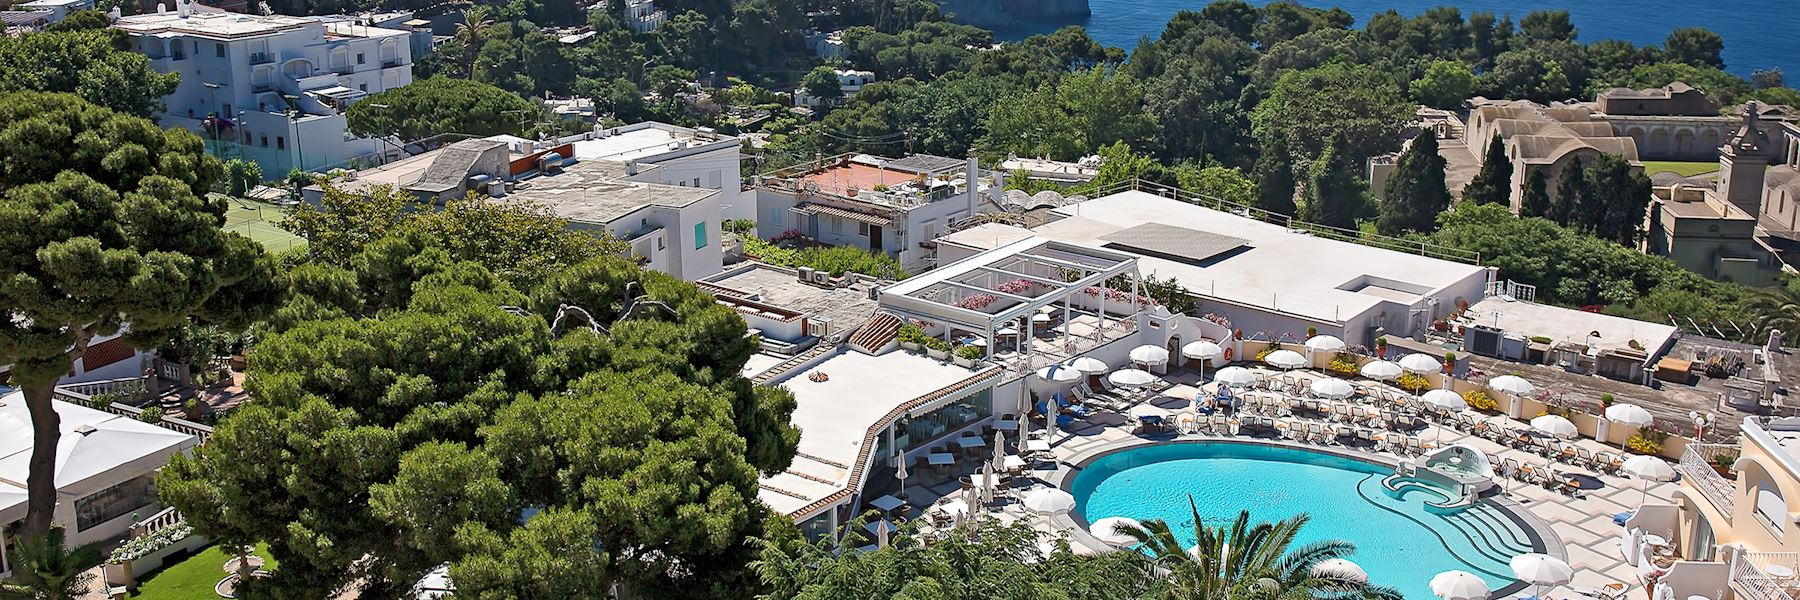 Grand Hotel Quisisana Hotels In Capri Audley Travel